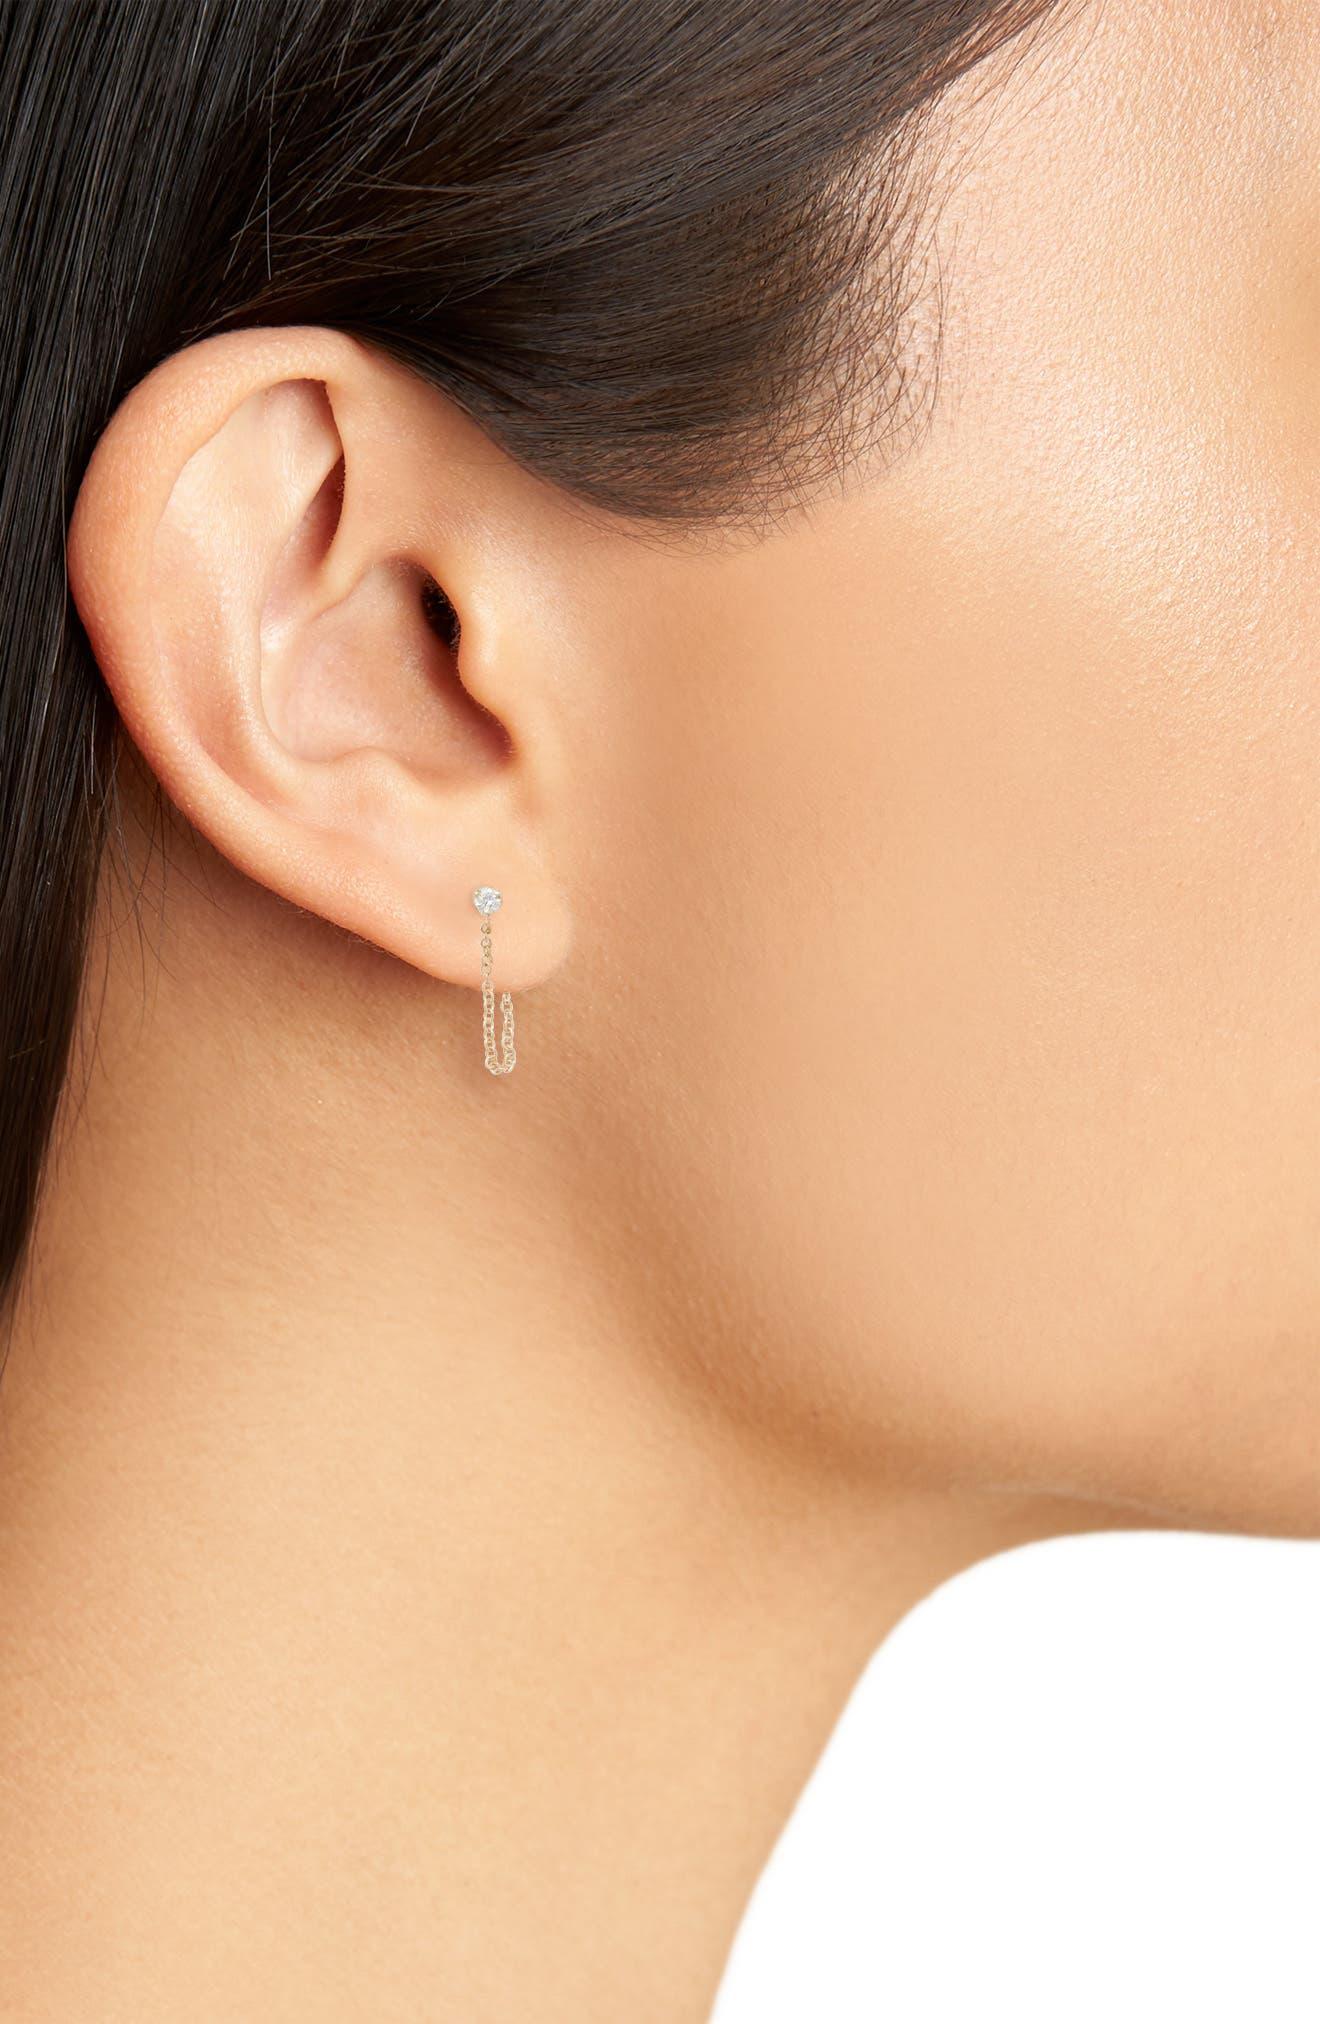 Diamond Chain Stud Earrings,                             Alternate thumbnail 2, color,                             710